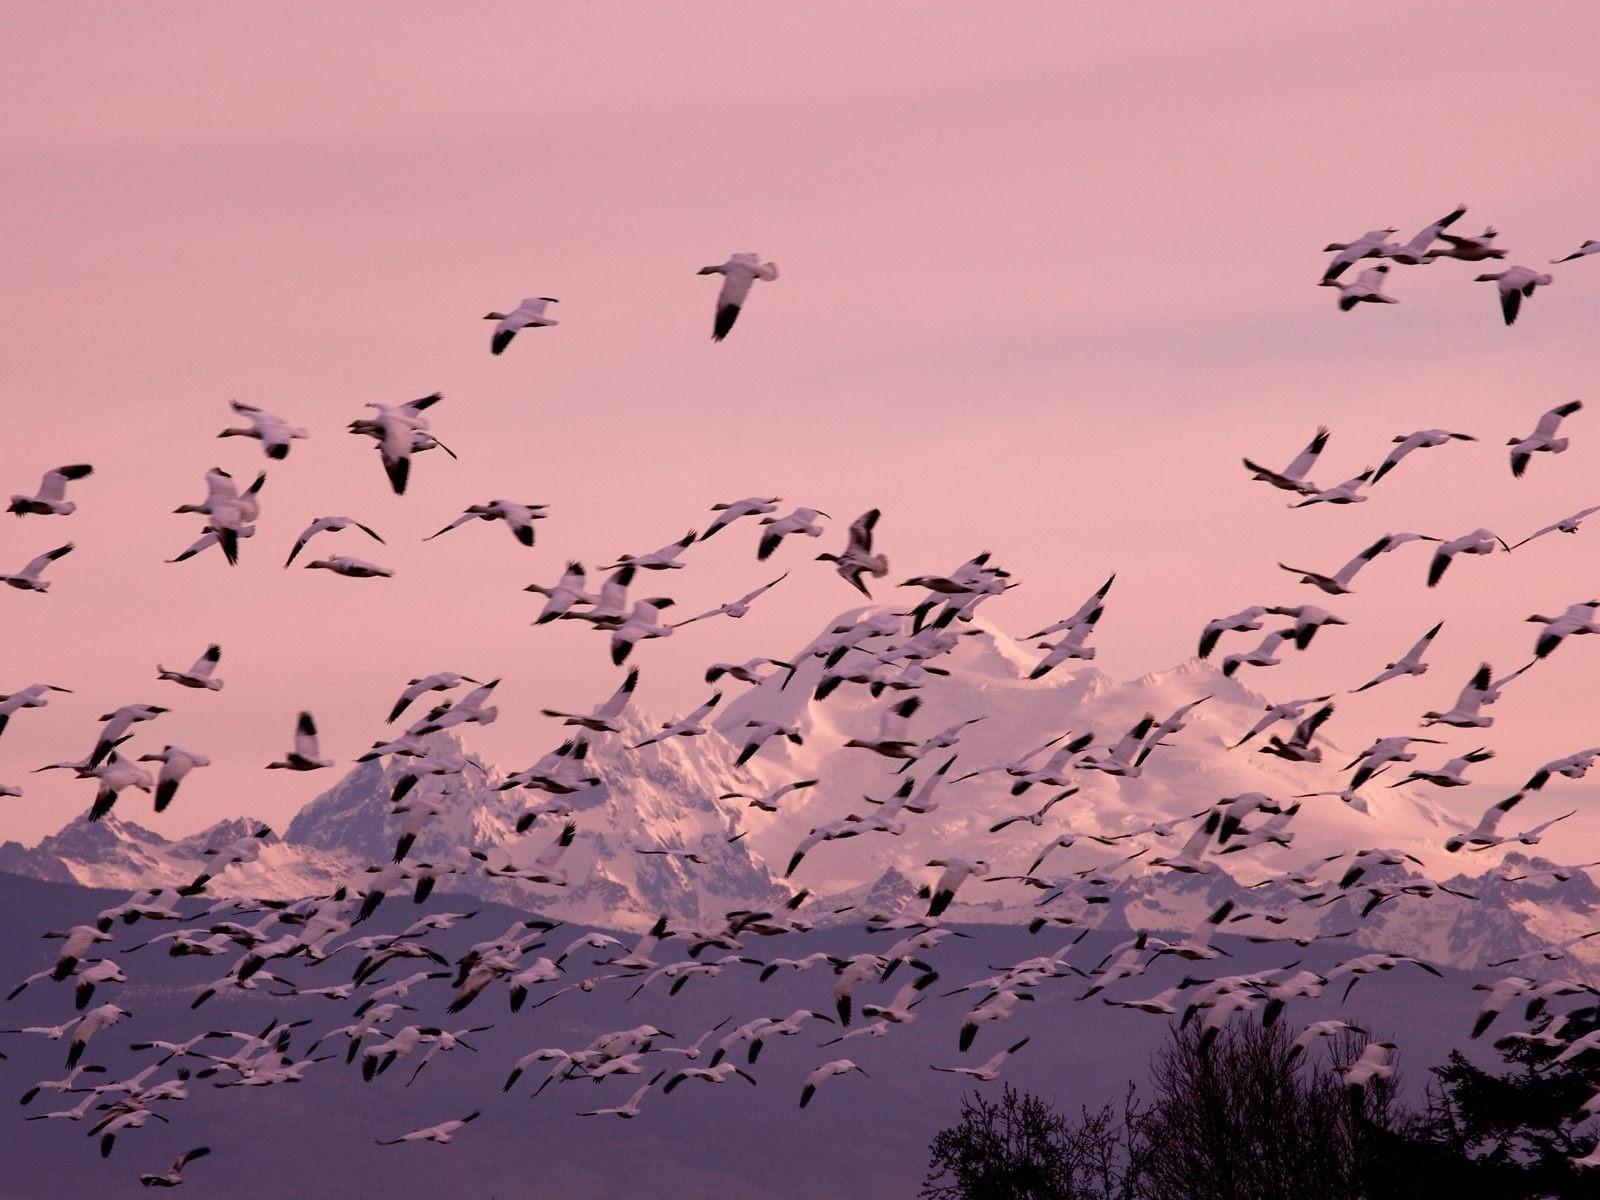 Flock Of Birds Hd , HD Wallpaper & Backgrounds